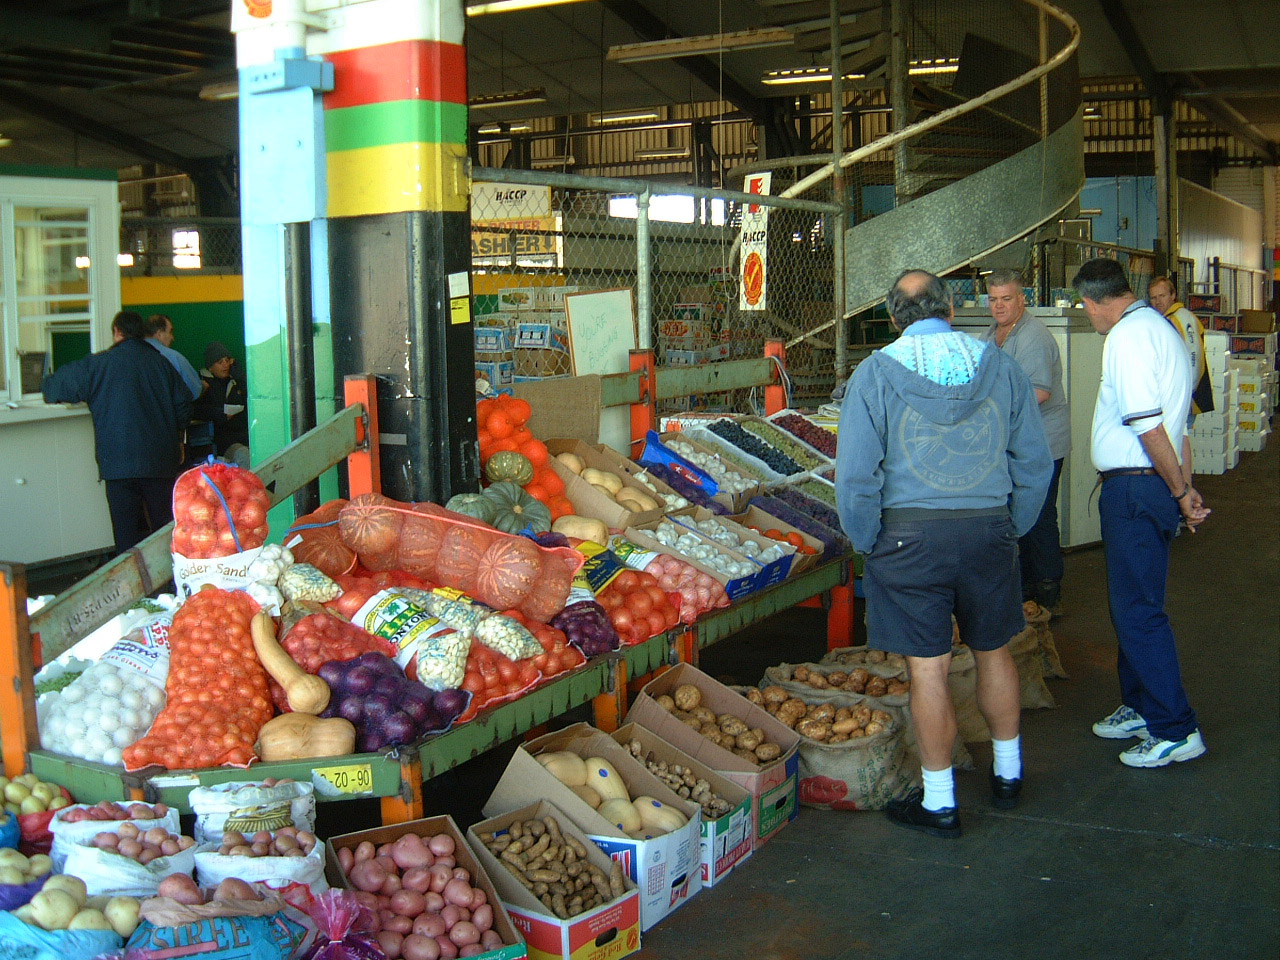 Brisbane Markets Sherwood Road Rocklea Queensland 4106 Jun 2002 I23